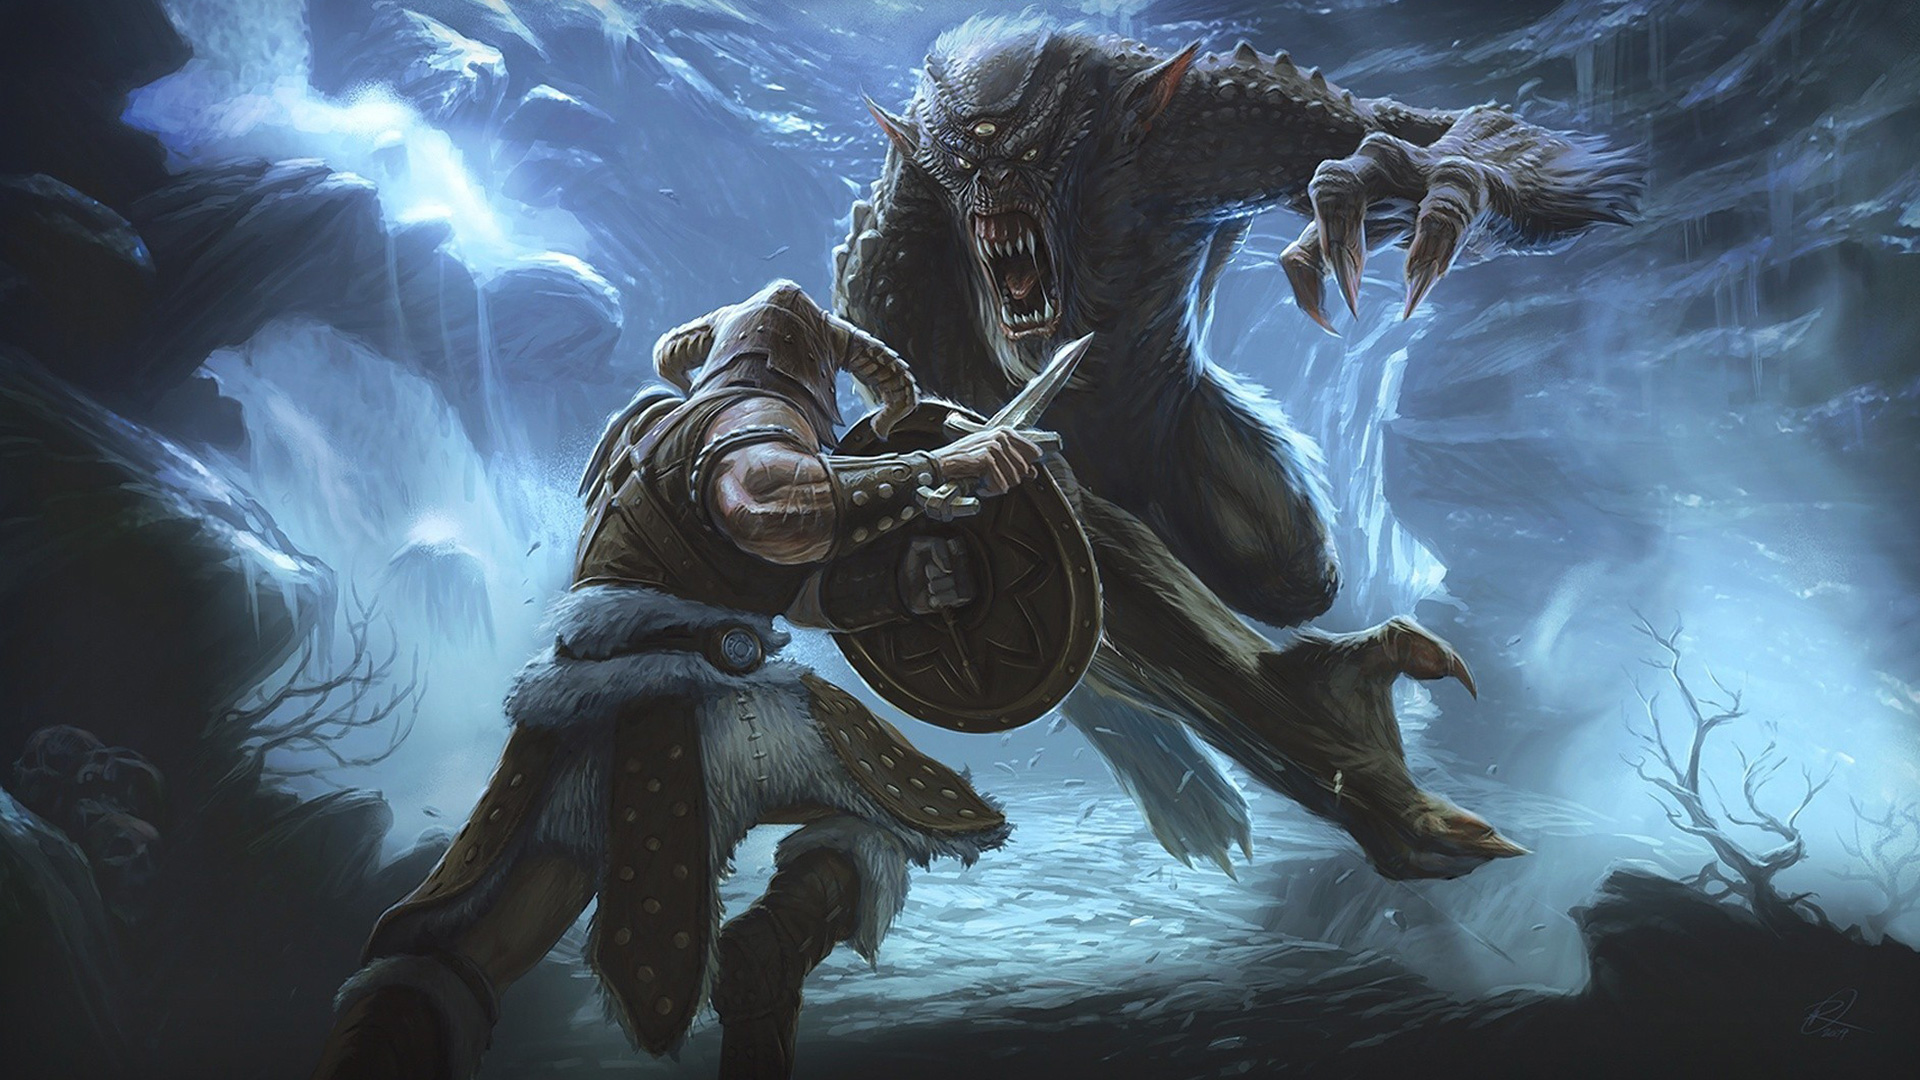 The Elder Scrolls V: Skyrim Wallpaper in 1920x1080